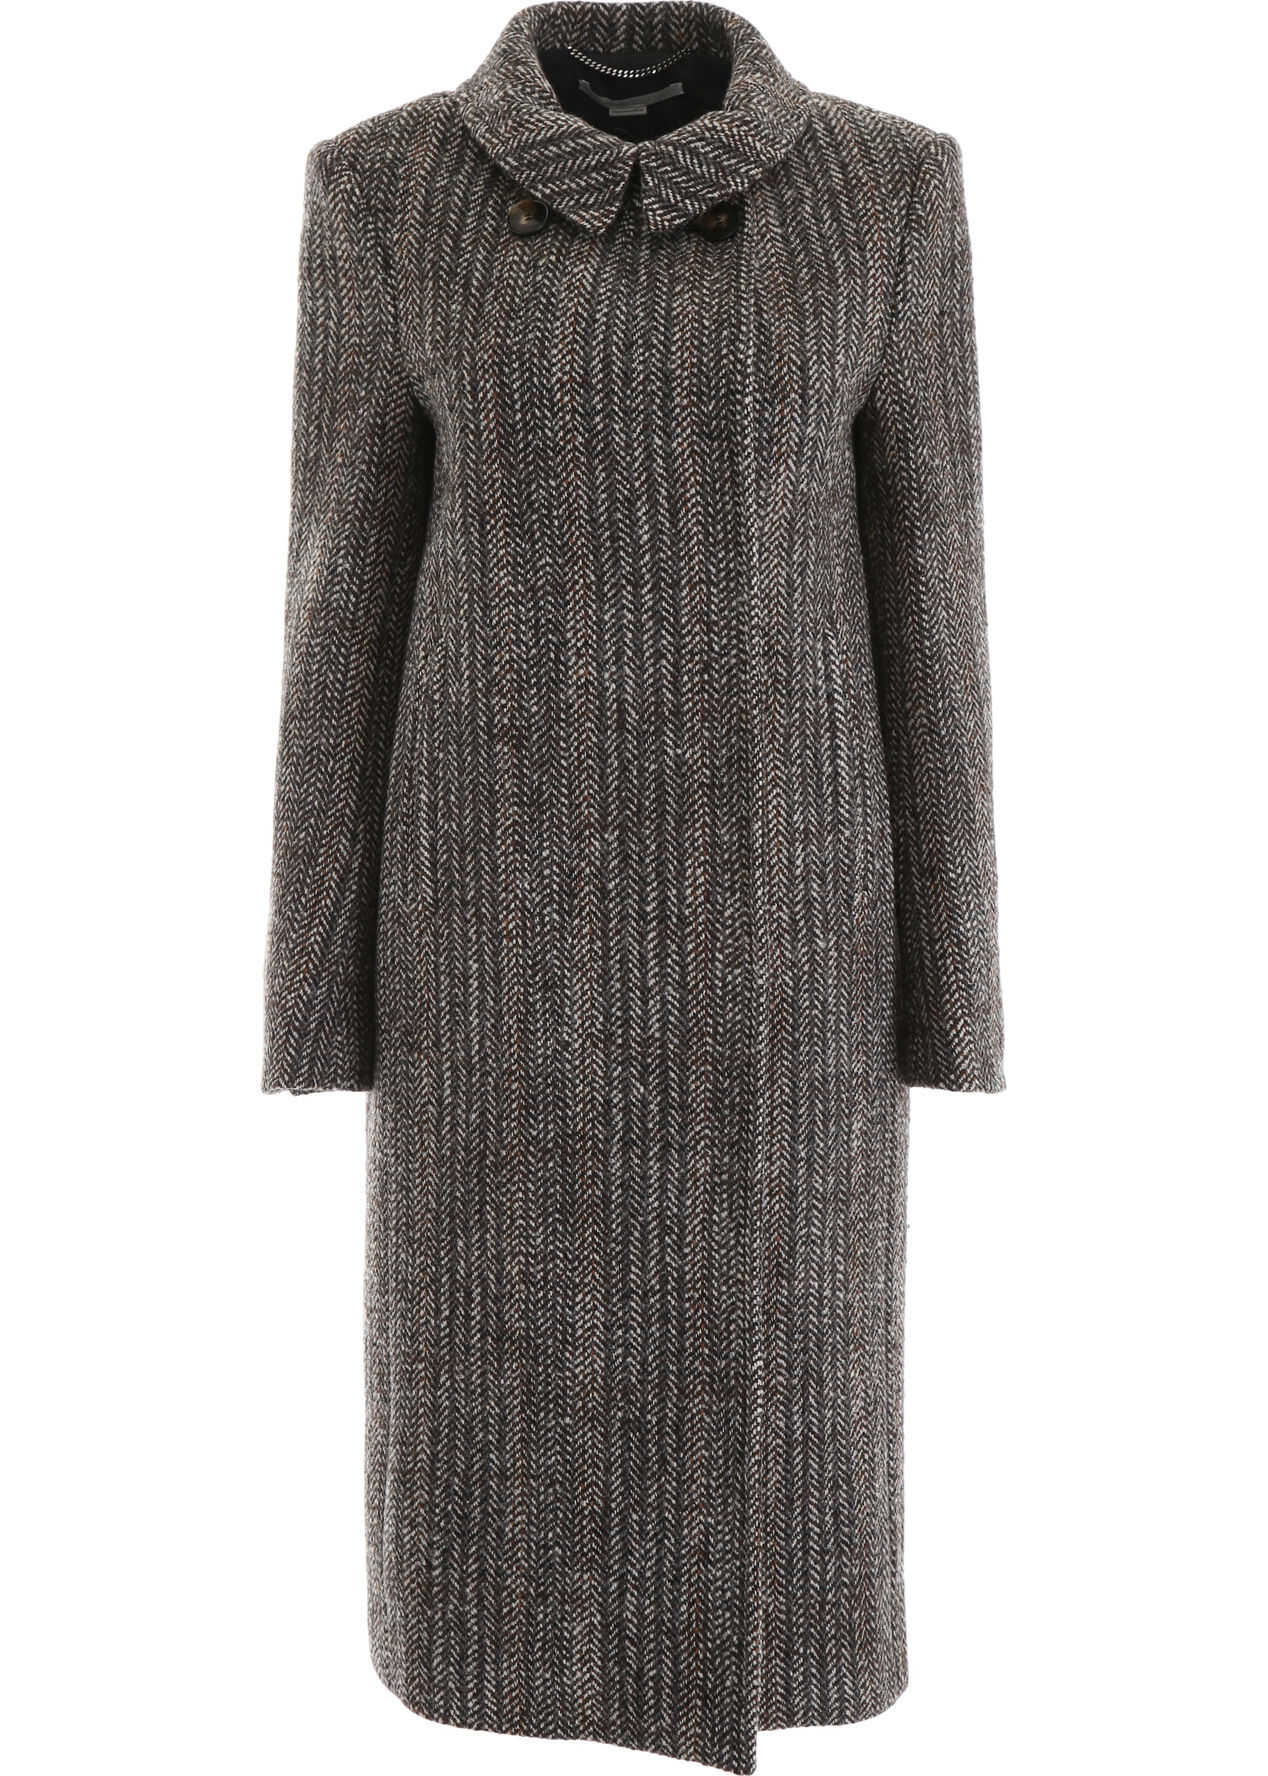 adidas by Stella McCartney Chevron Coat BLACK